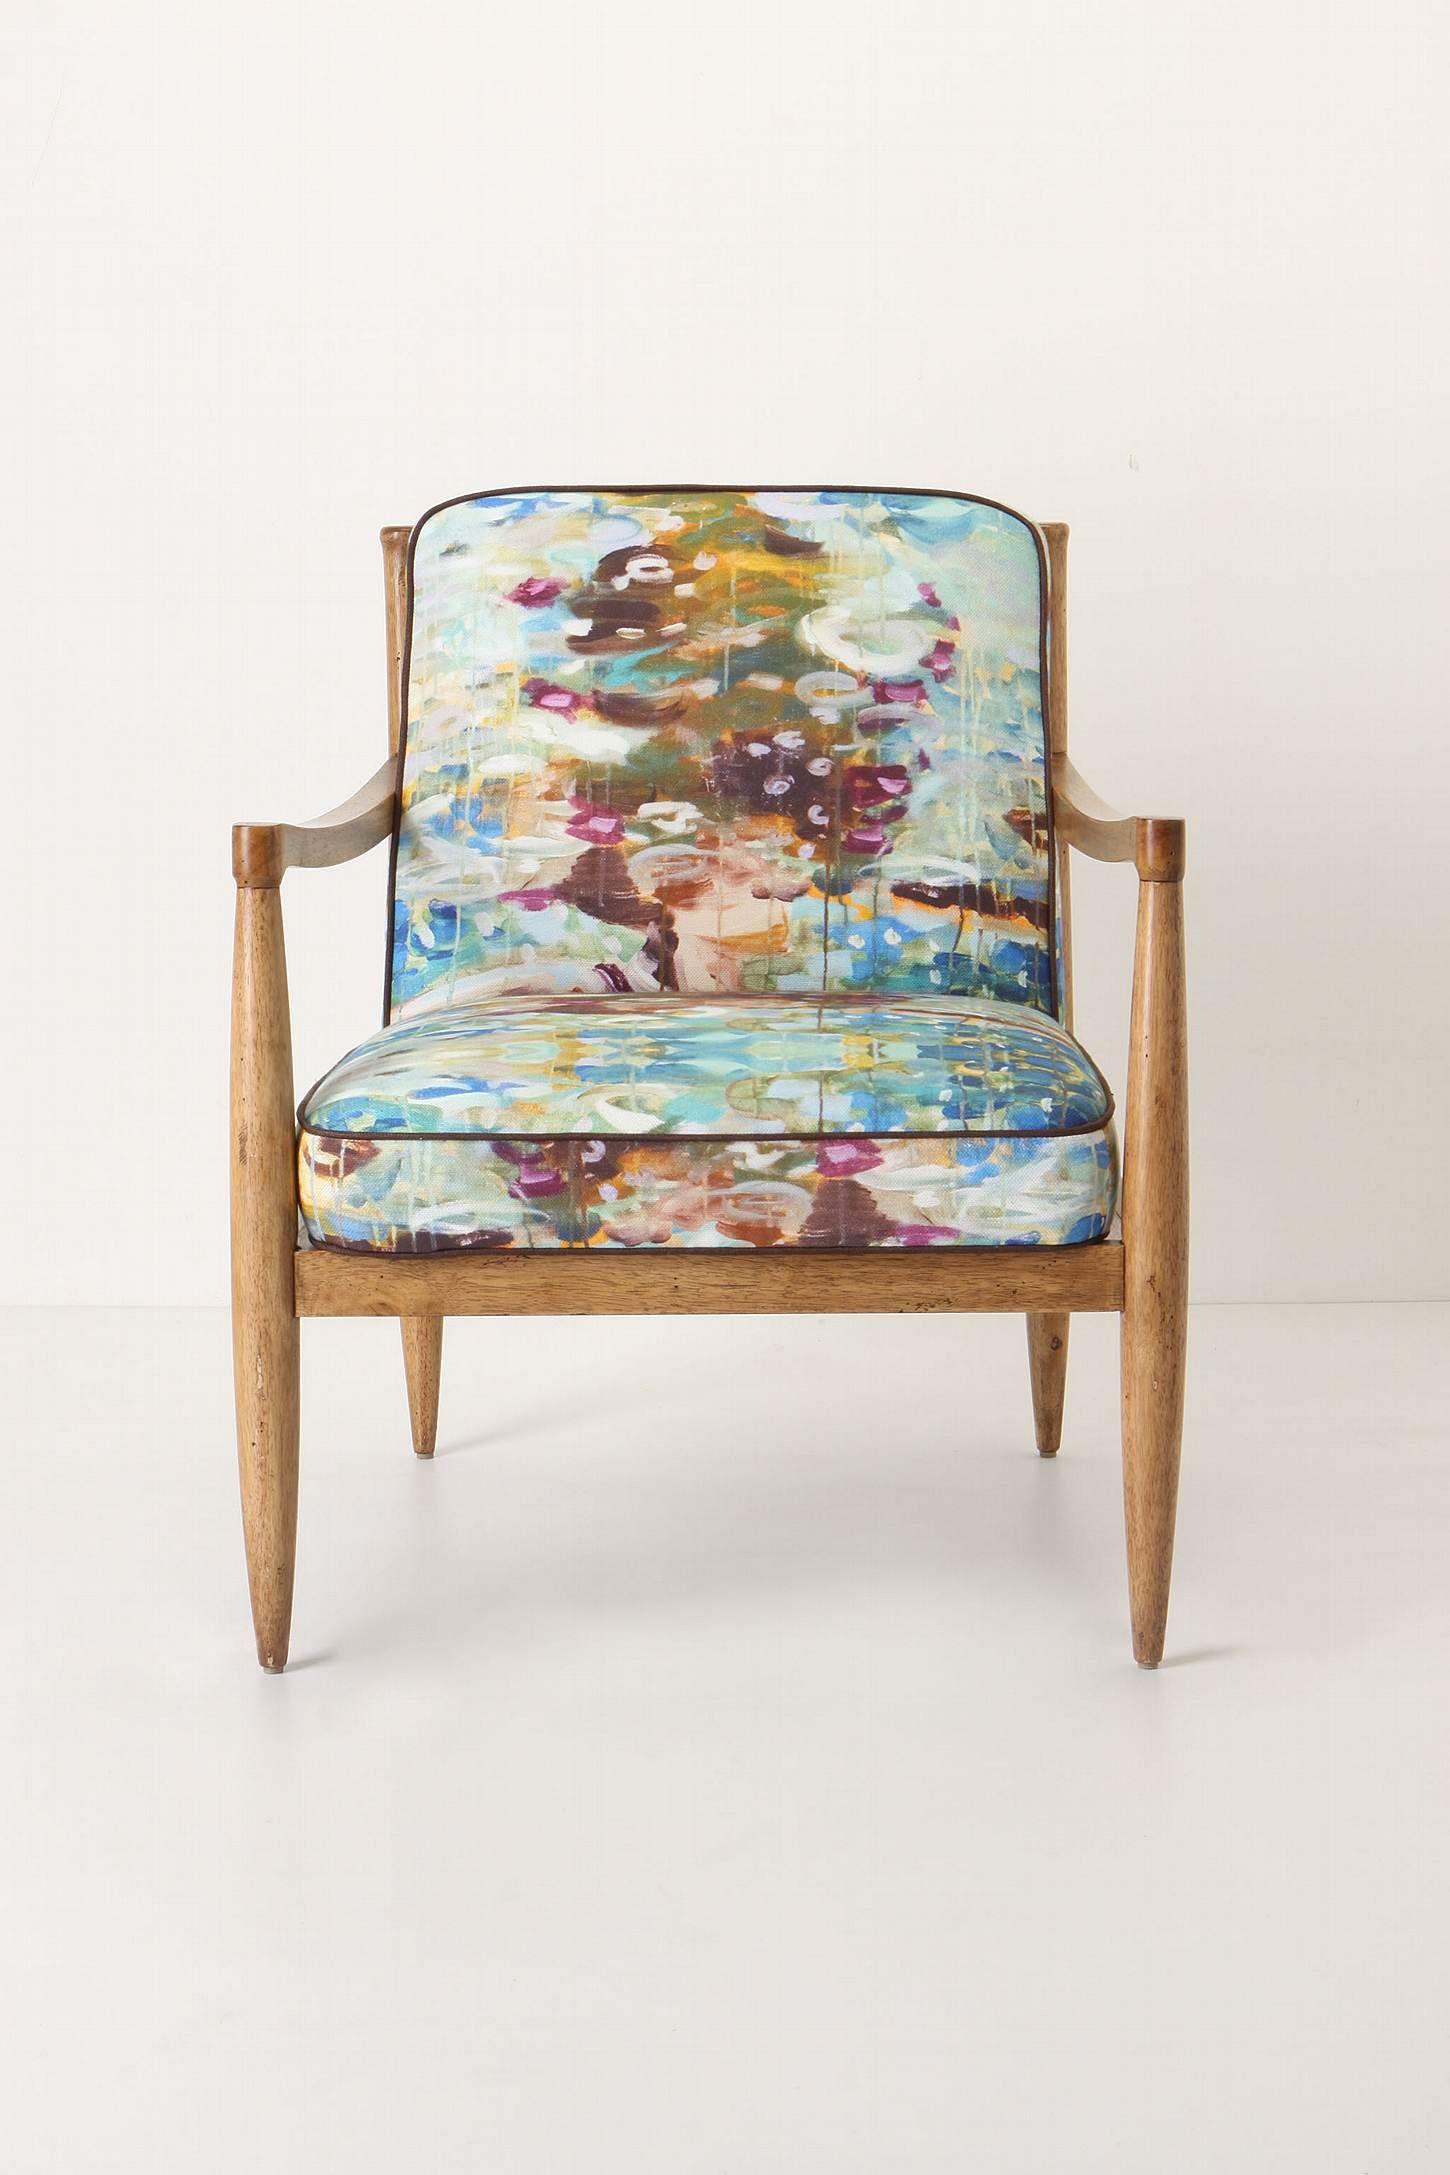 Beautiful Design By New Orleans Artist Ashley Longshore